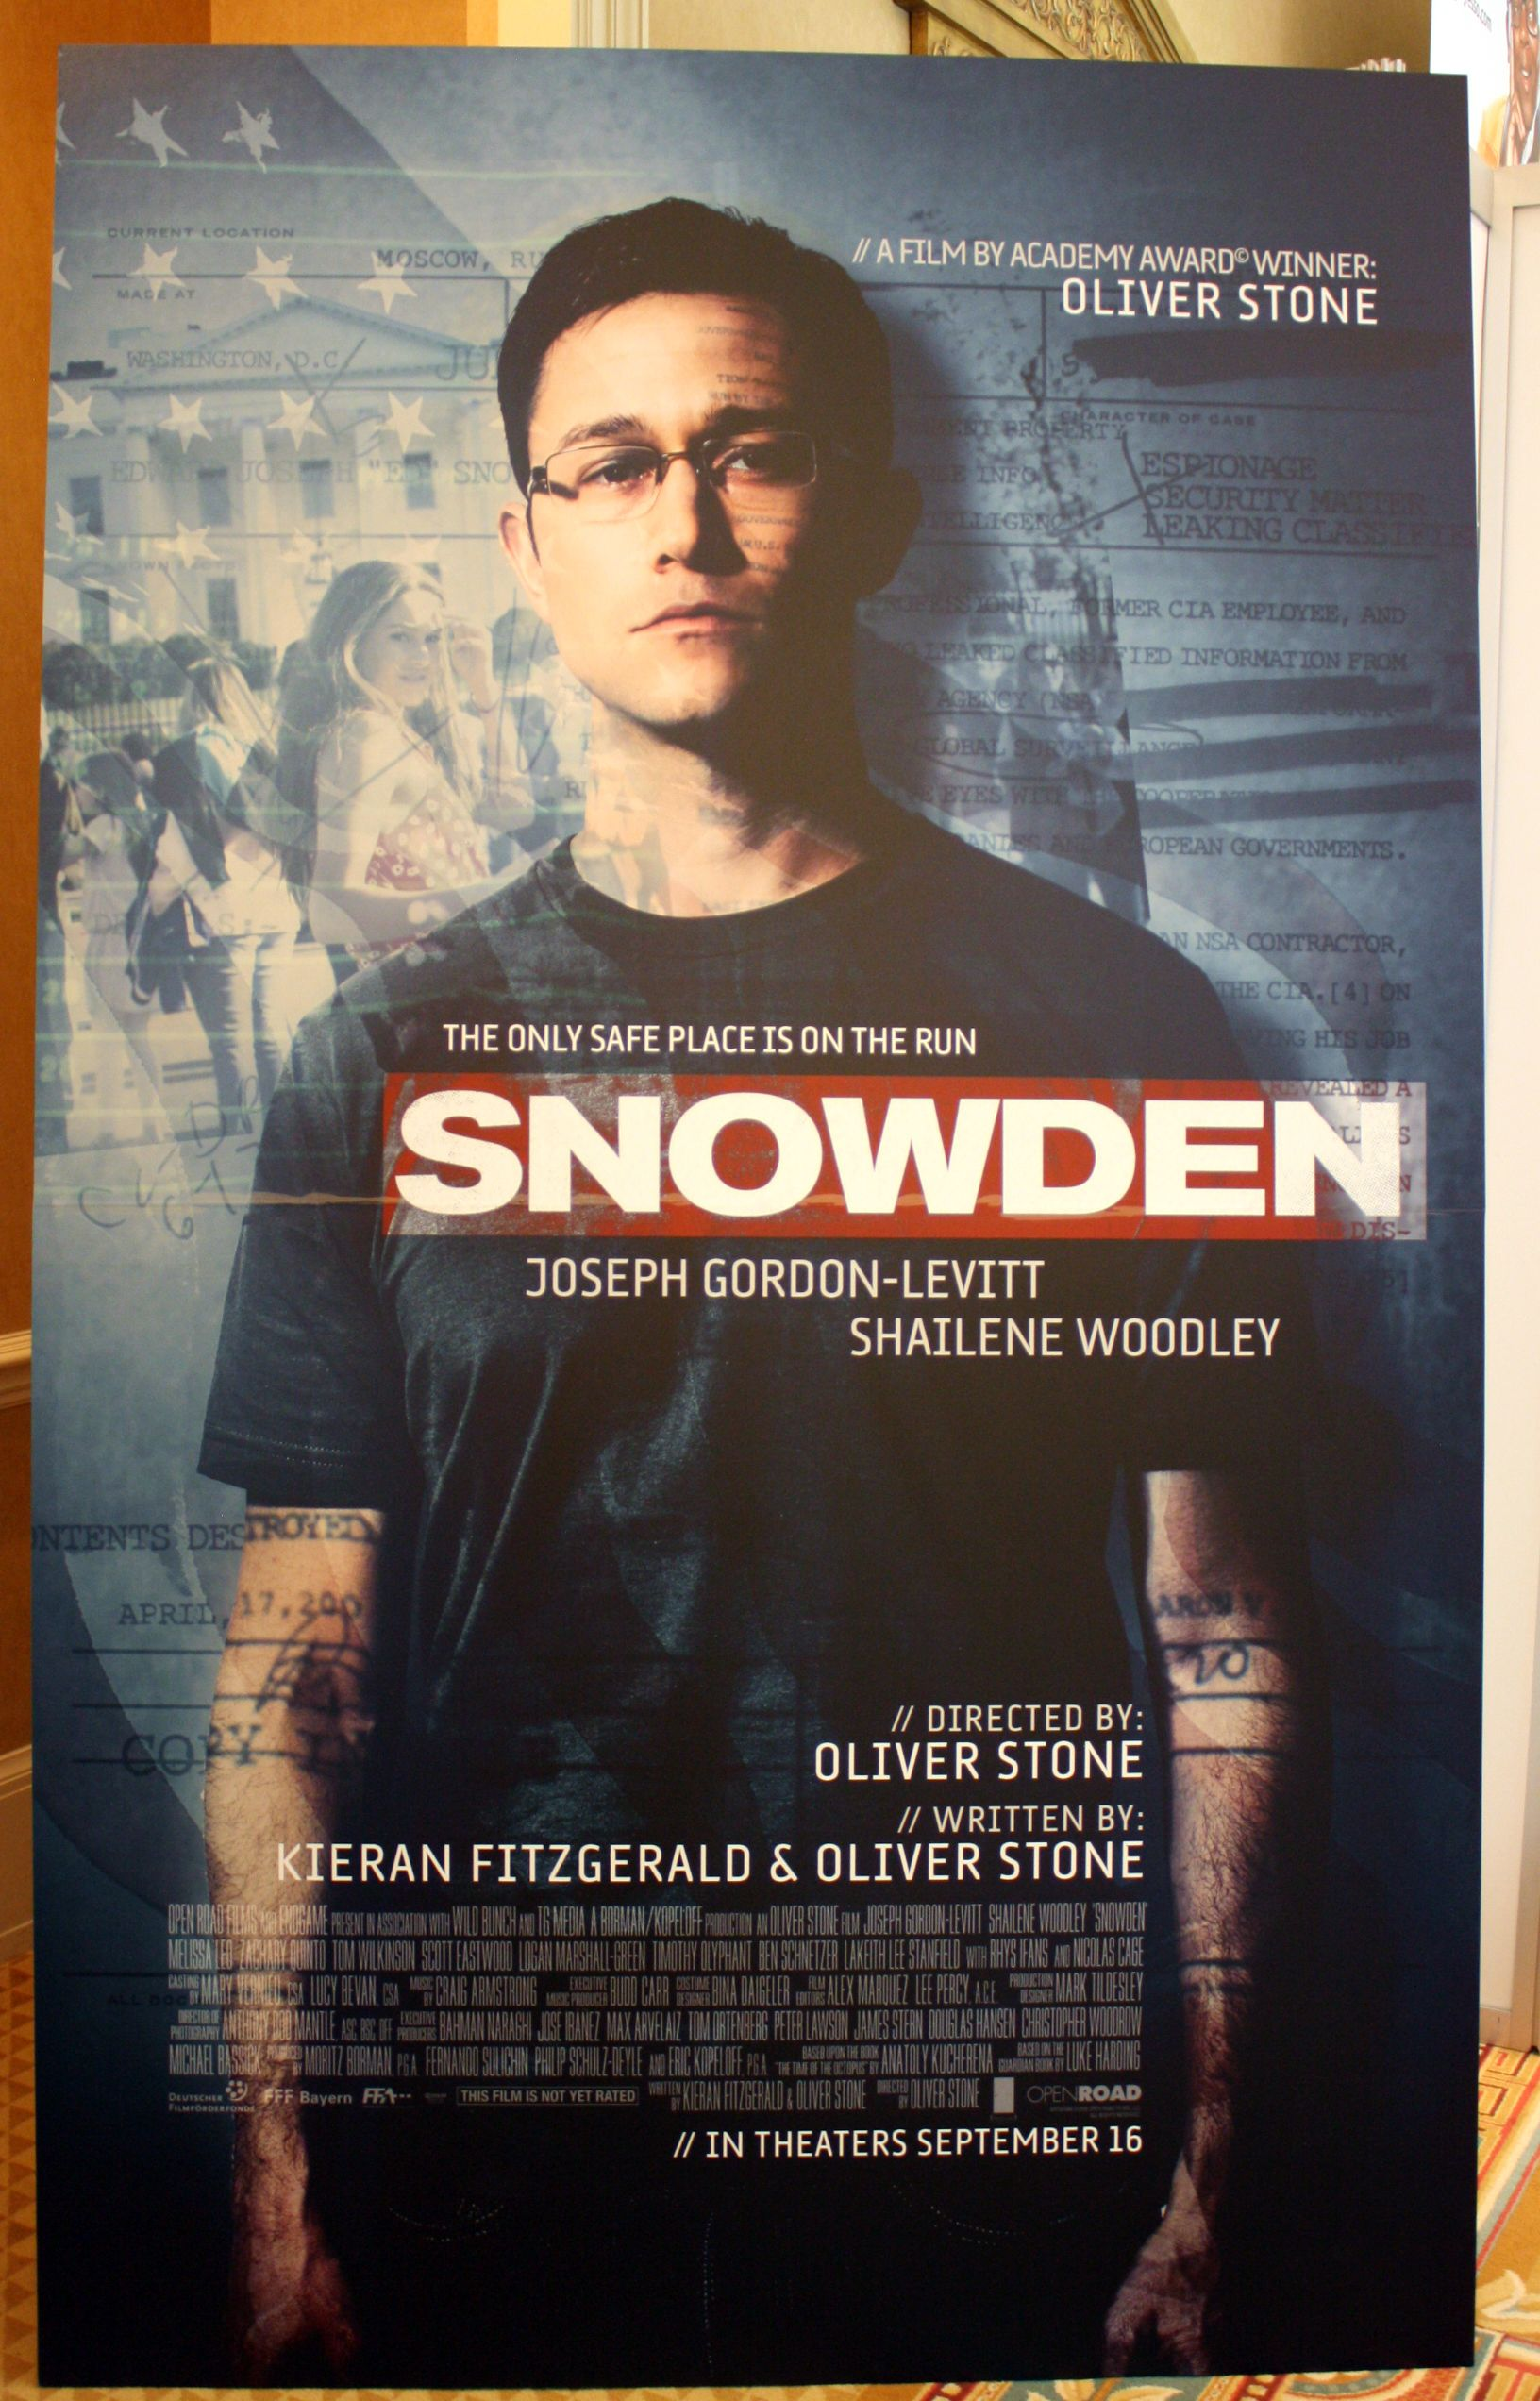 movie snowden poster posters passengers train film patriots trailer movies collider levitt nsa whistle blower gordon joseph magnificent hero